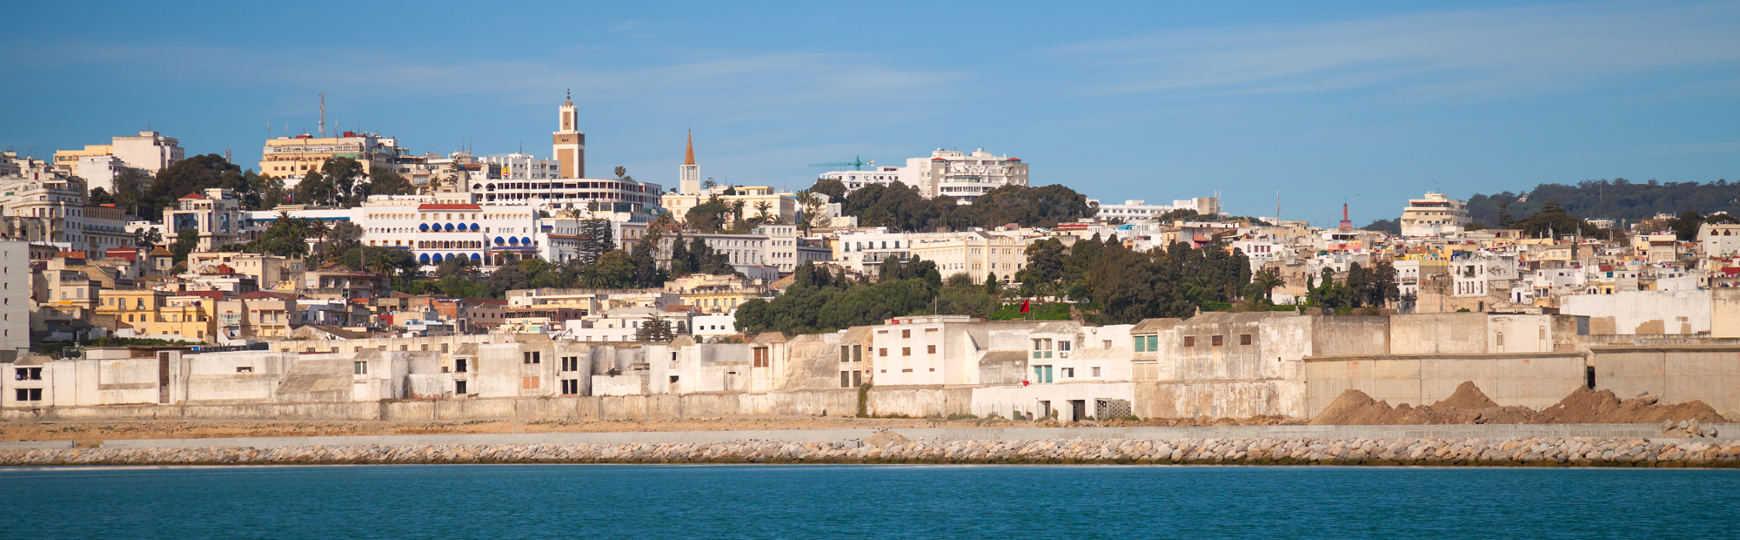 noleggio barca a vela Marocco